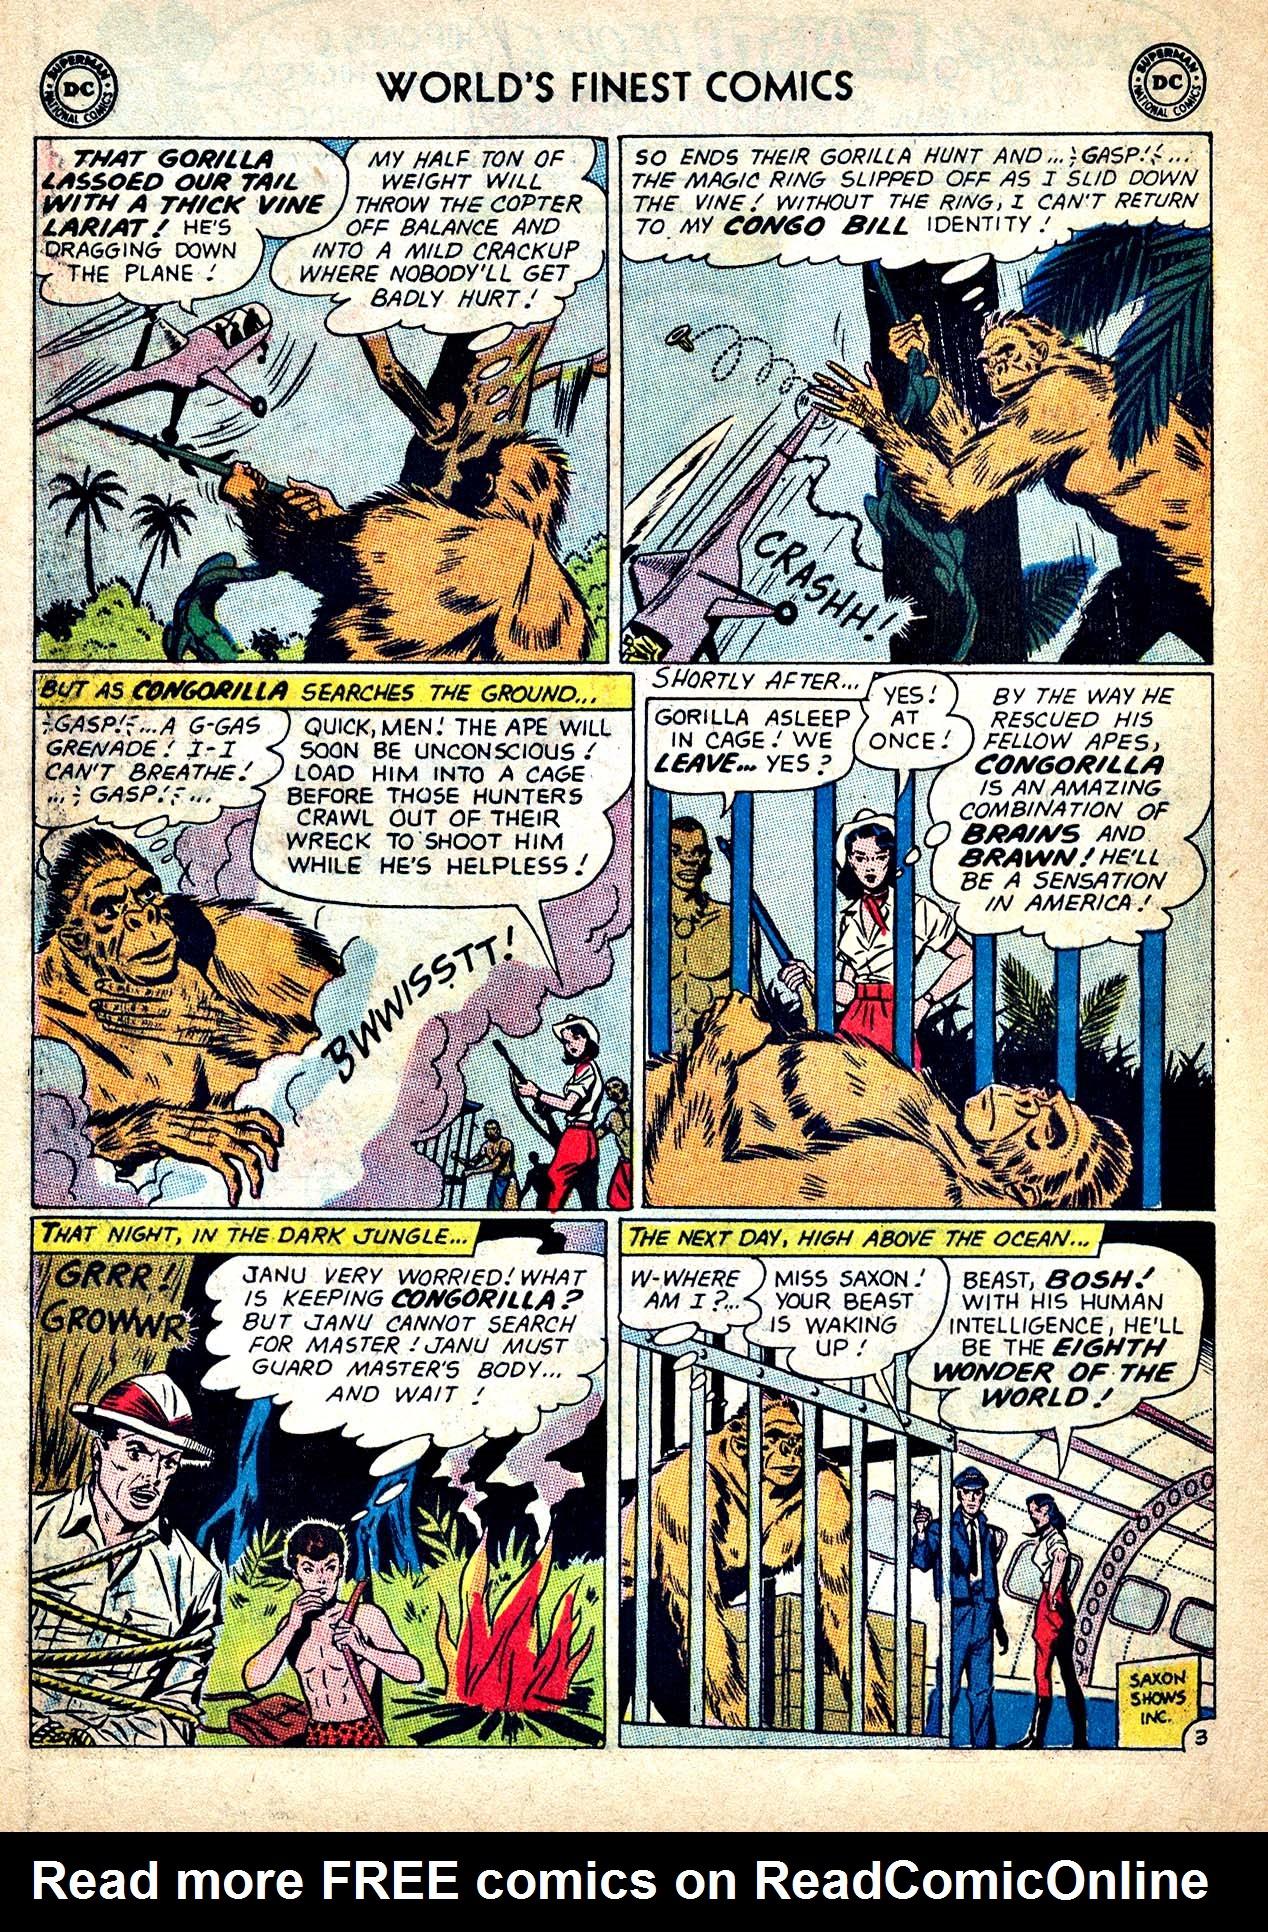 Read online World's Finest Comics comic -  Issue #150 - 26